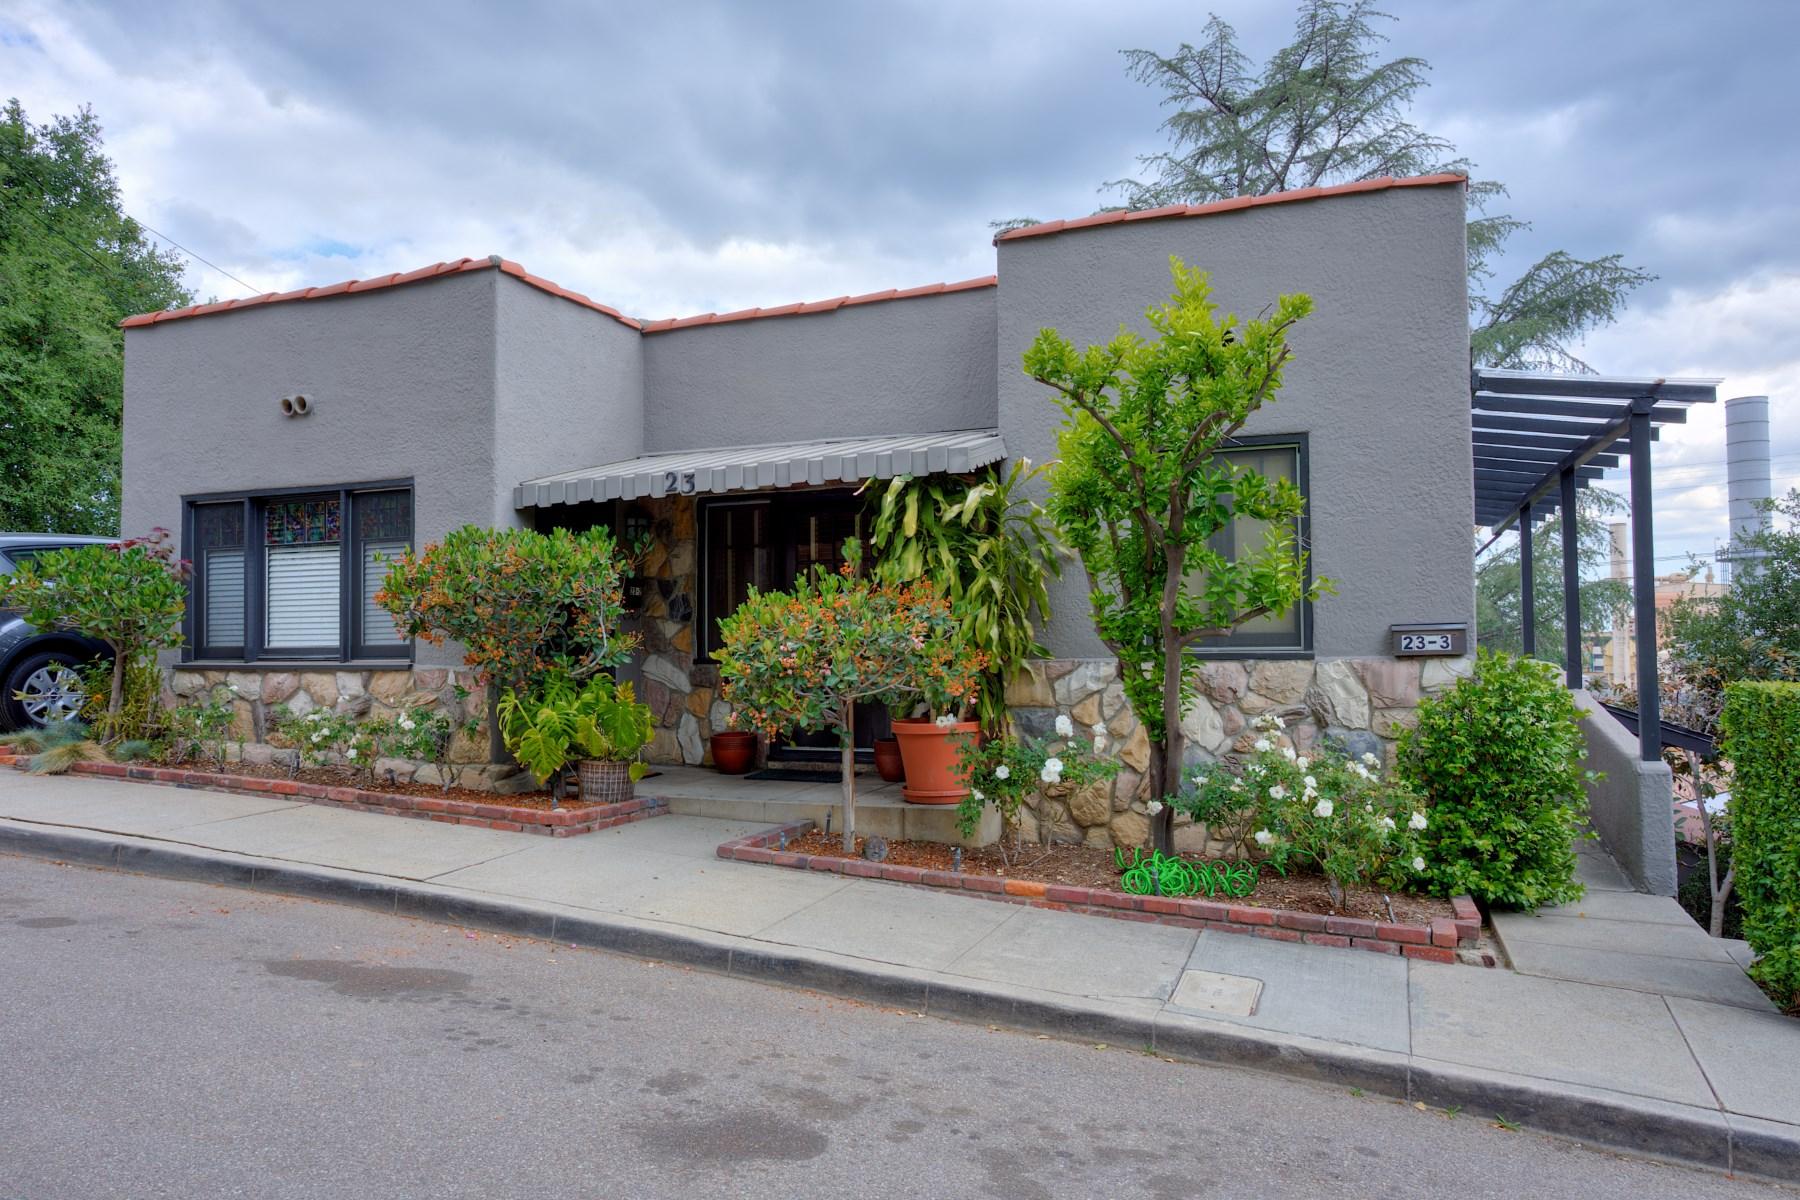 Multi-Family Home for Sale at Southwest Pasadena Units 23 Grace Terrace Pasadena, California 91105 United States